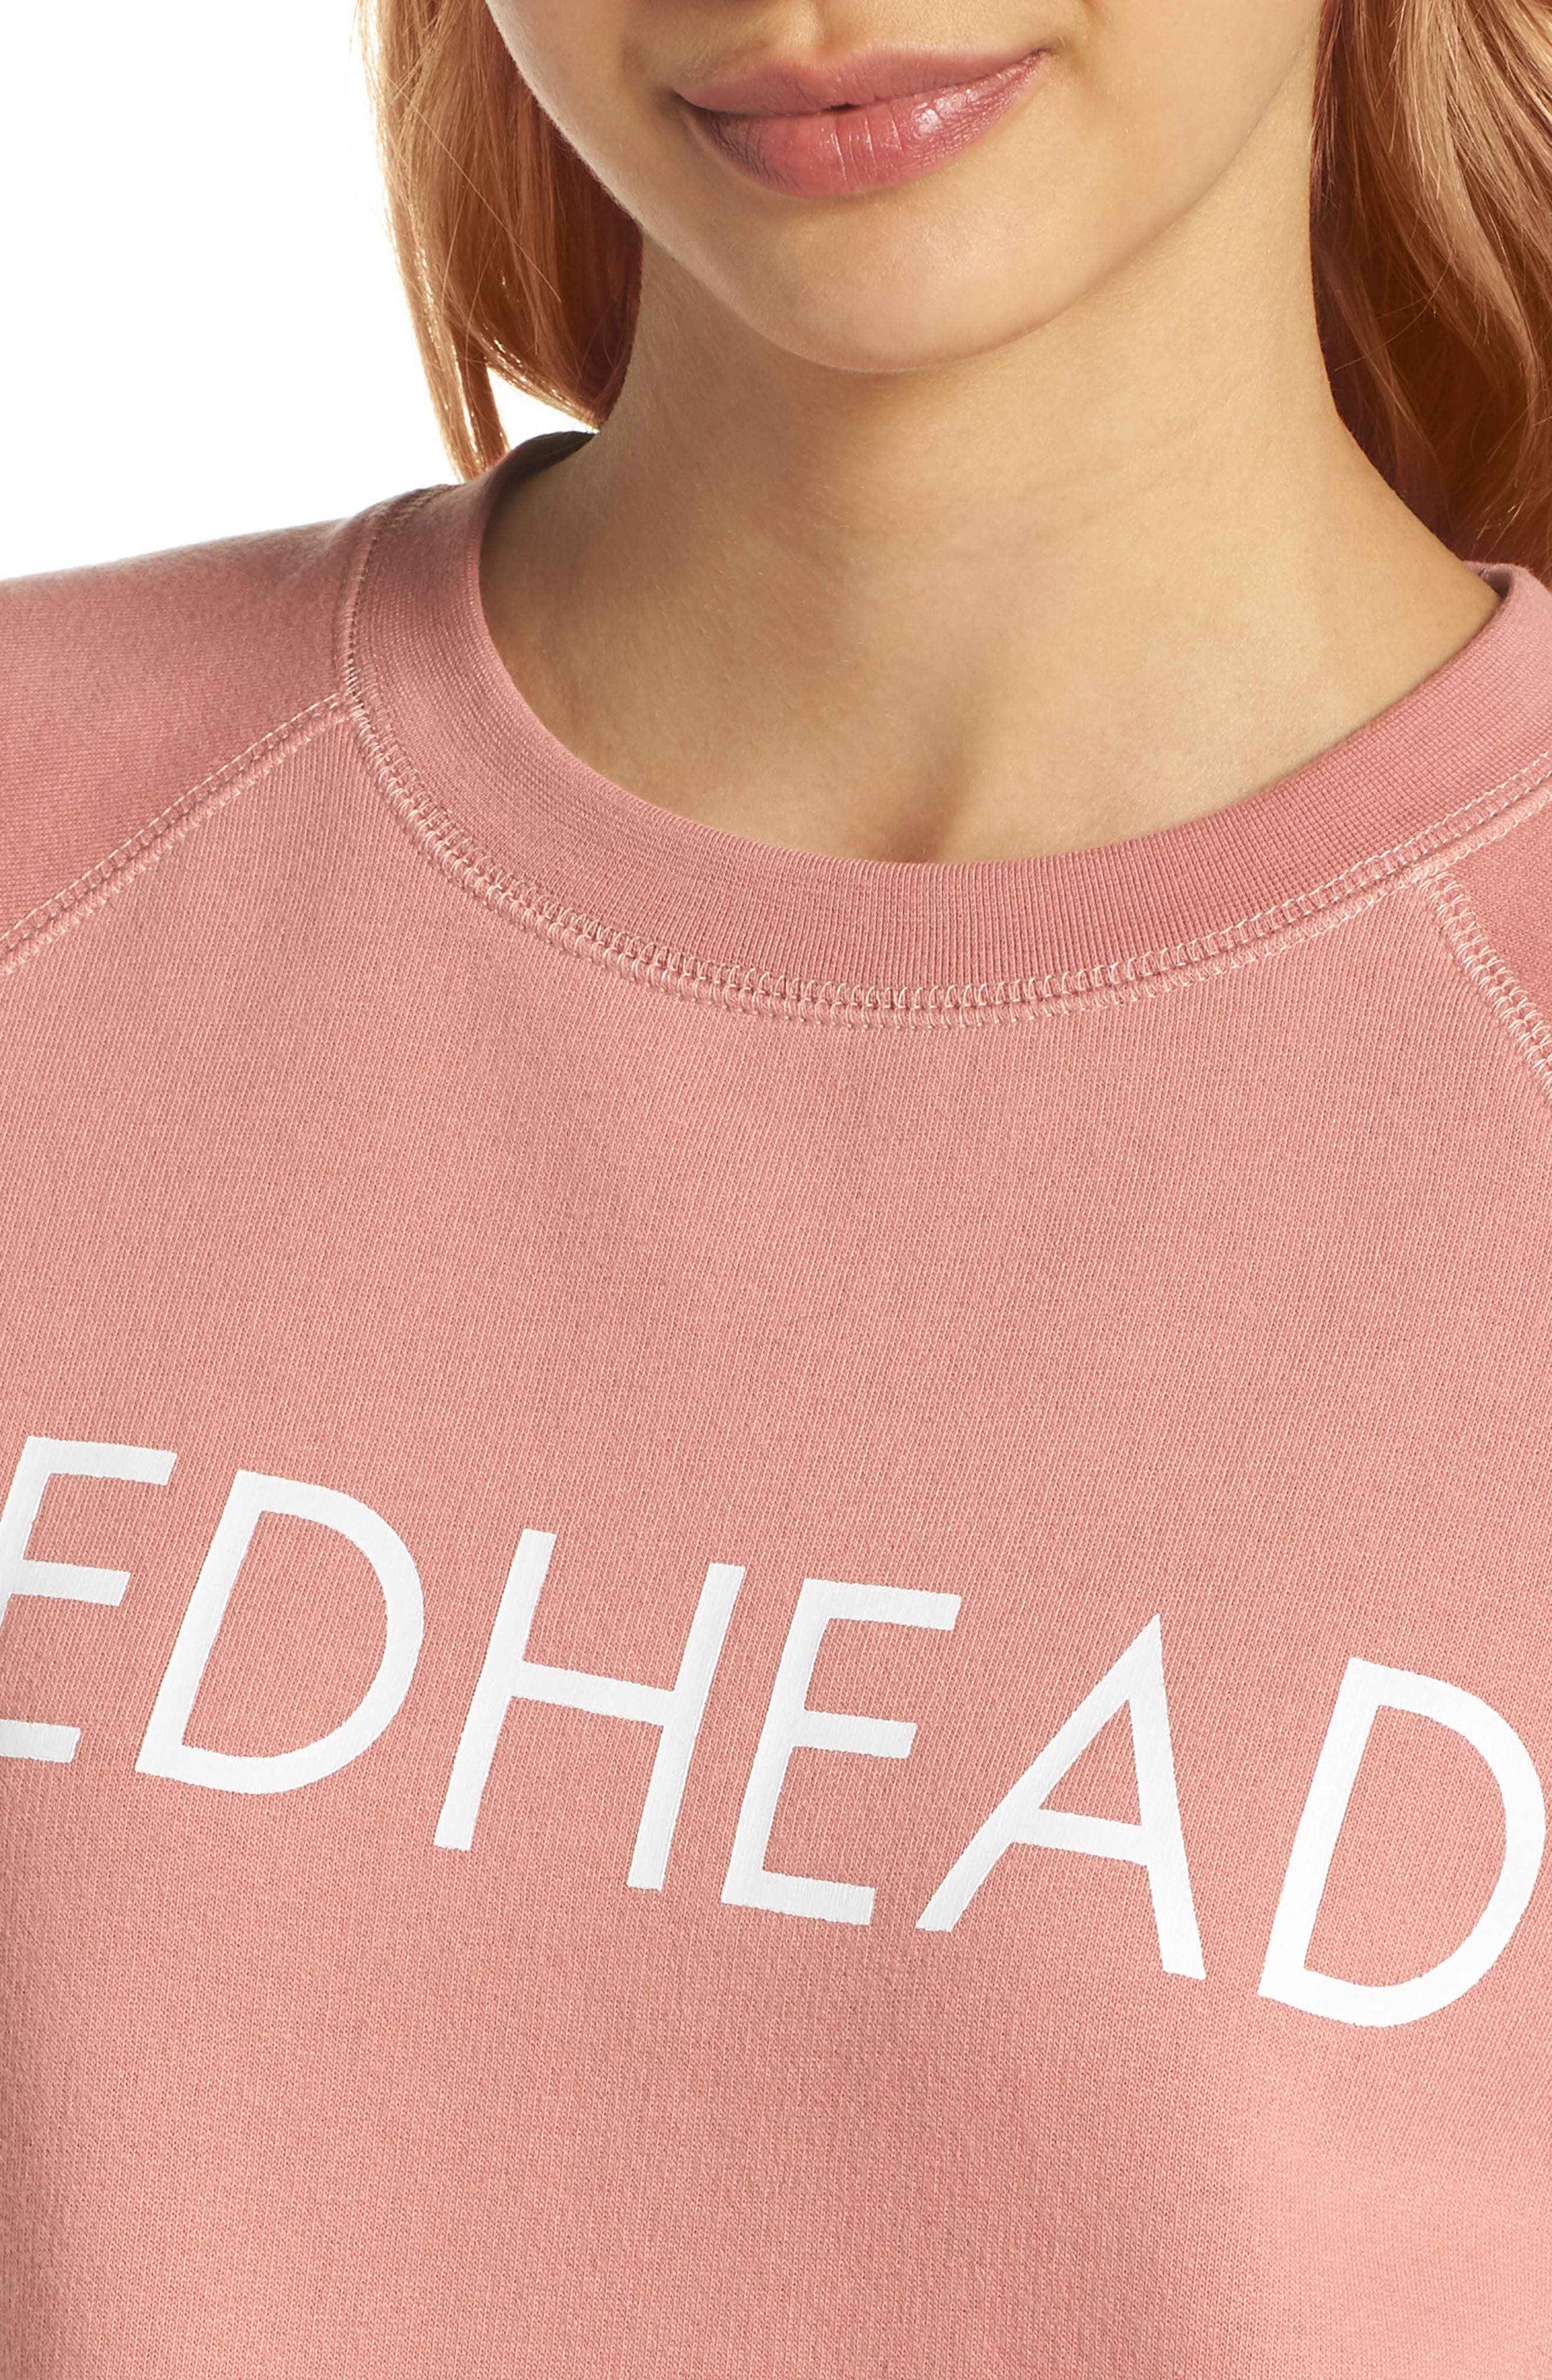 Redhead Crewneck Sweatshirt,                             Alternate thumbnail 5, color,                             Dusty Rose